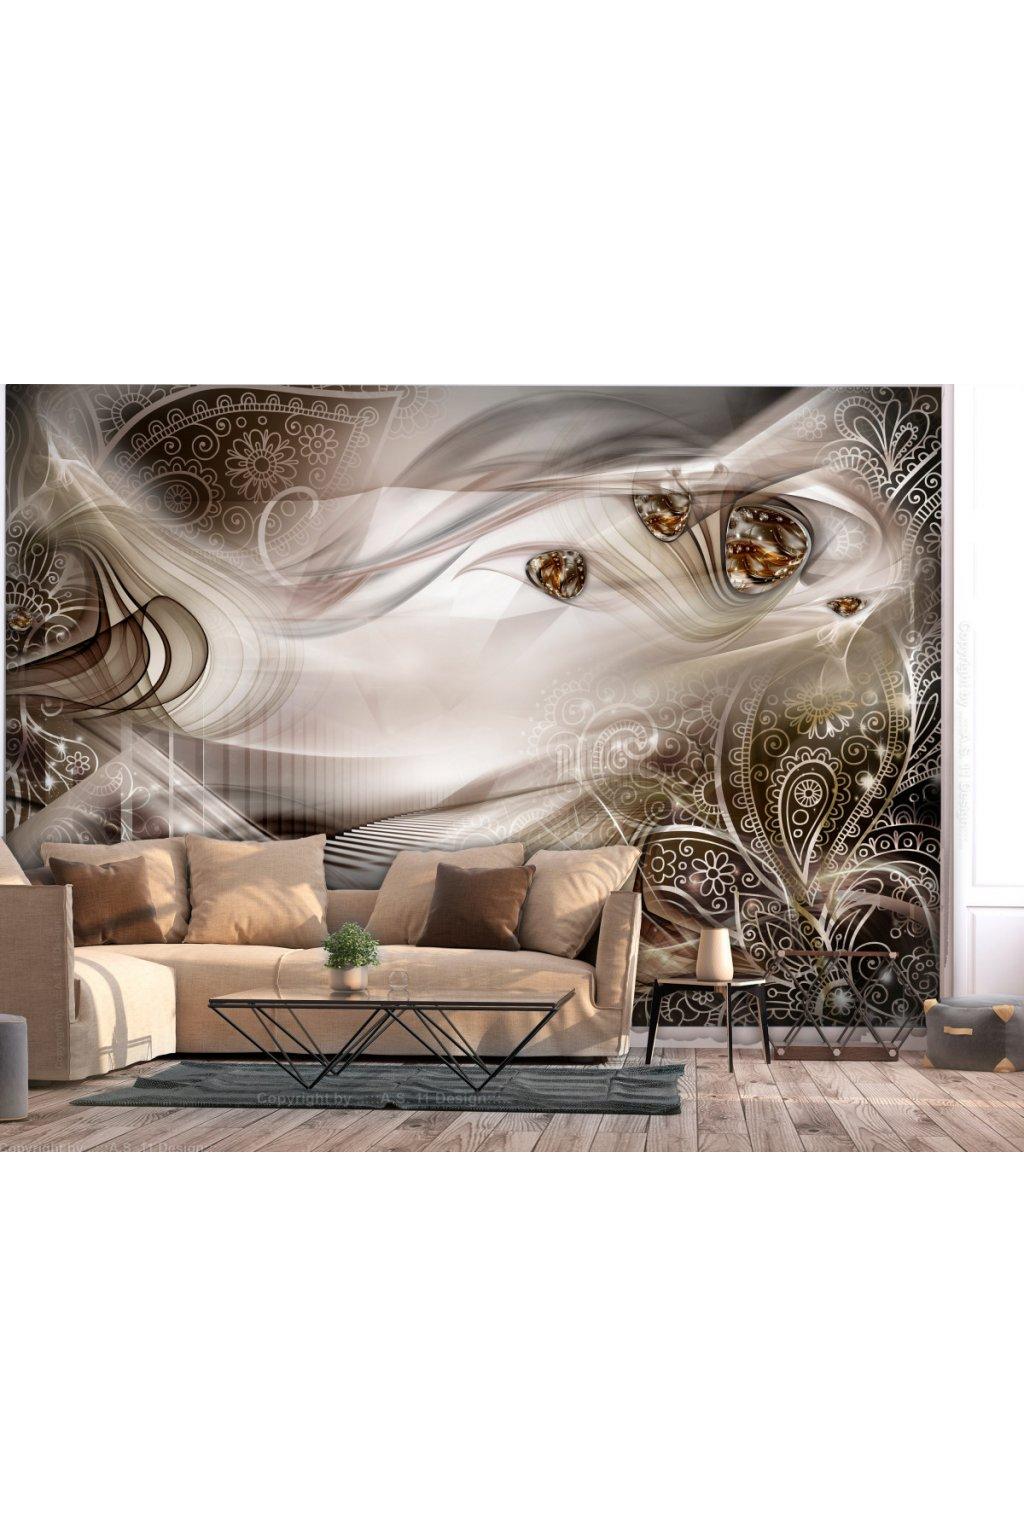 Murando DeLuxe Tapeta abstrakce - hnìdá  - zvìtšit obrázek